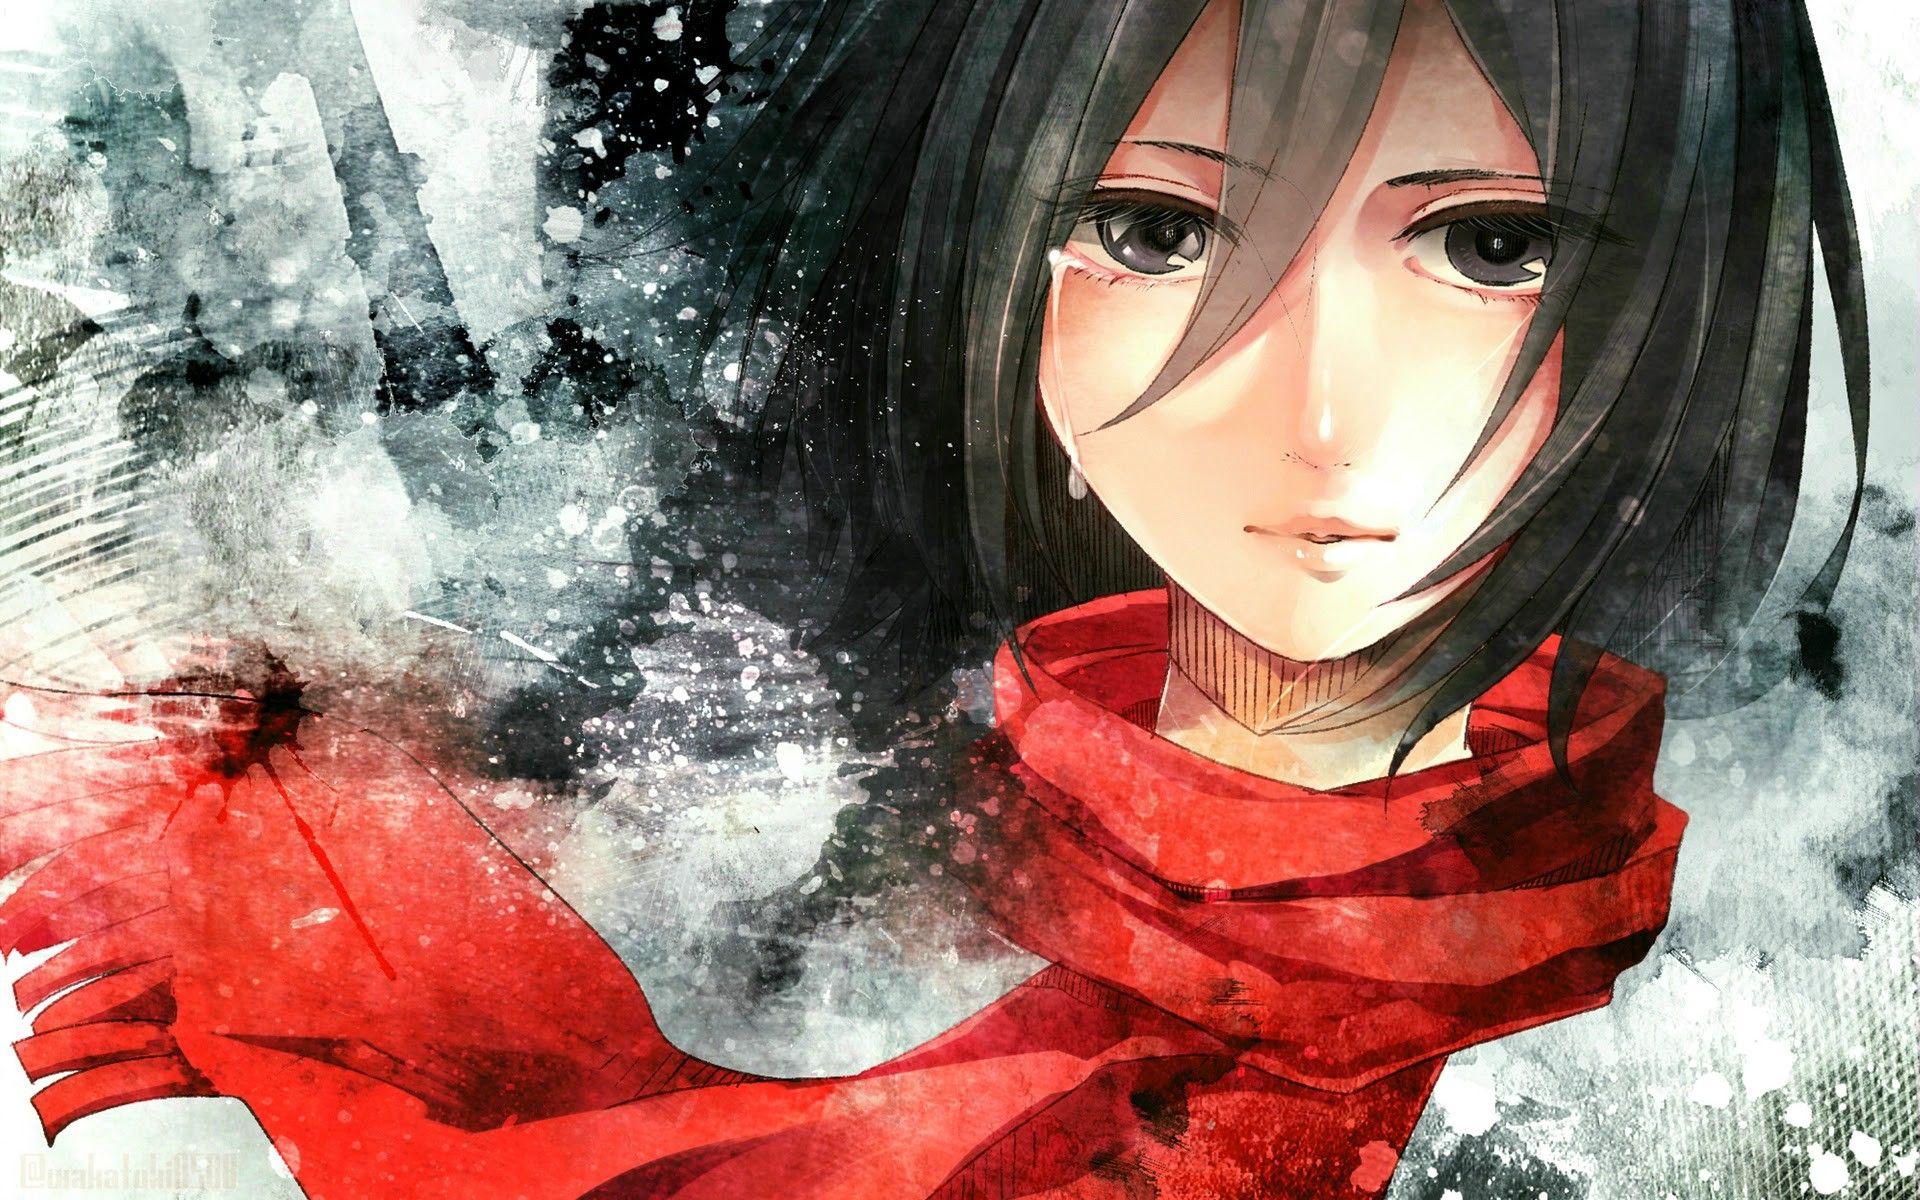 Anime Attack On Titan Mikasa Ackerman Shingeki No Kyojin